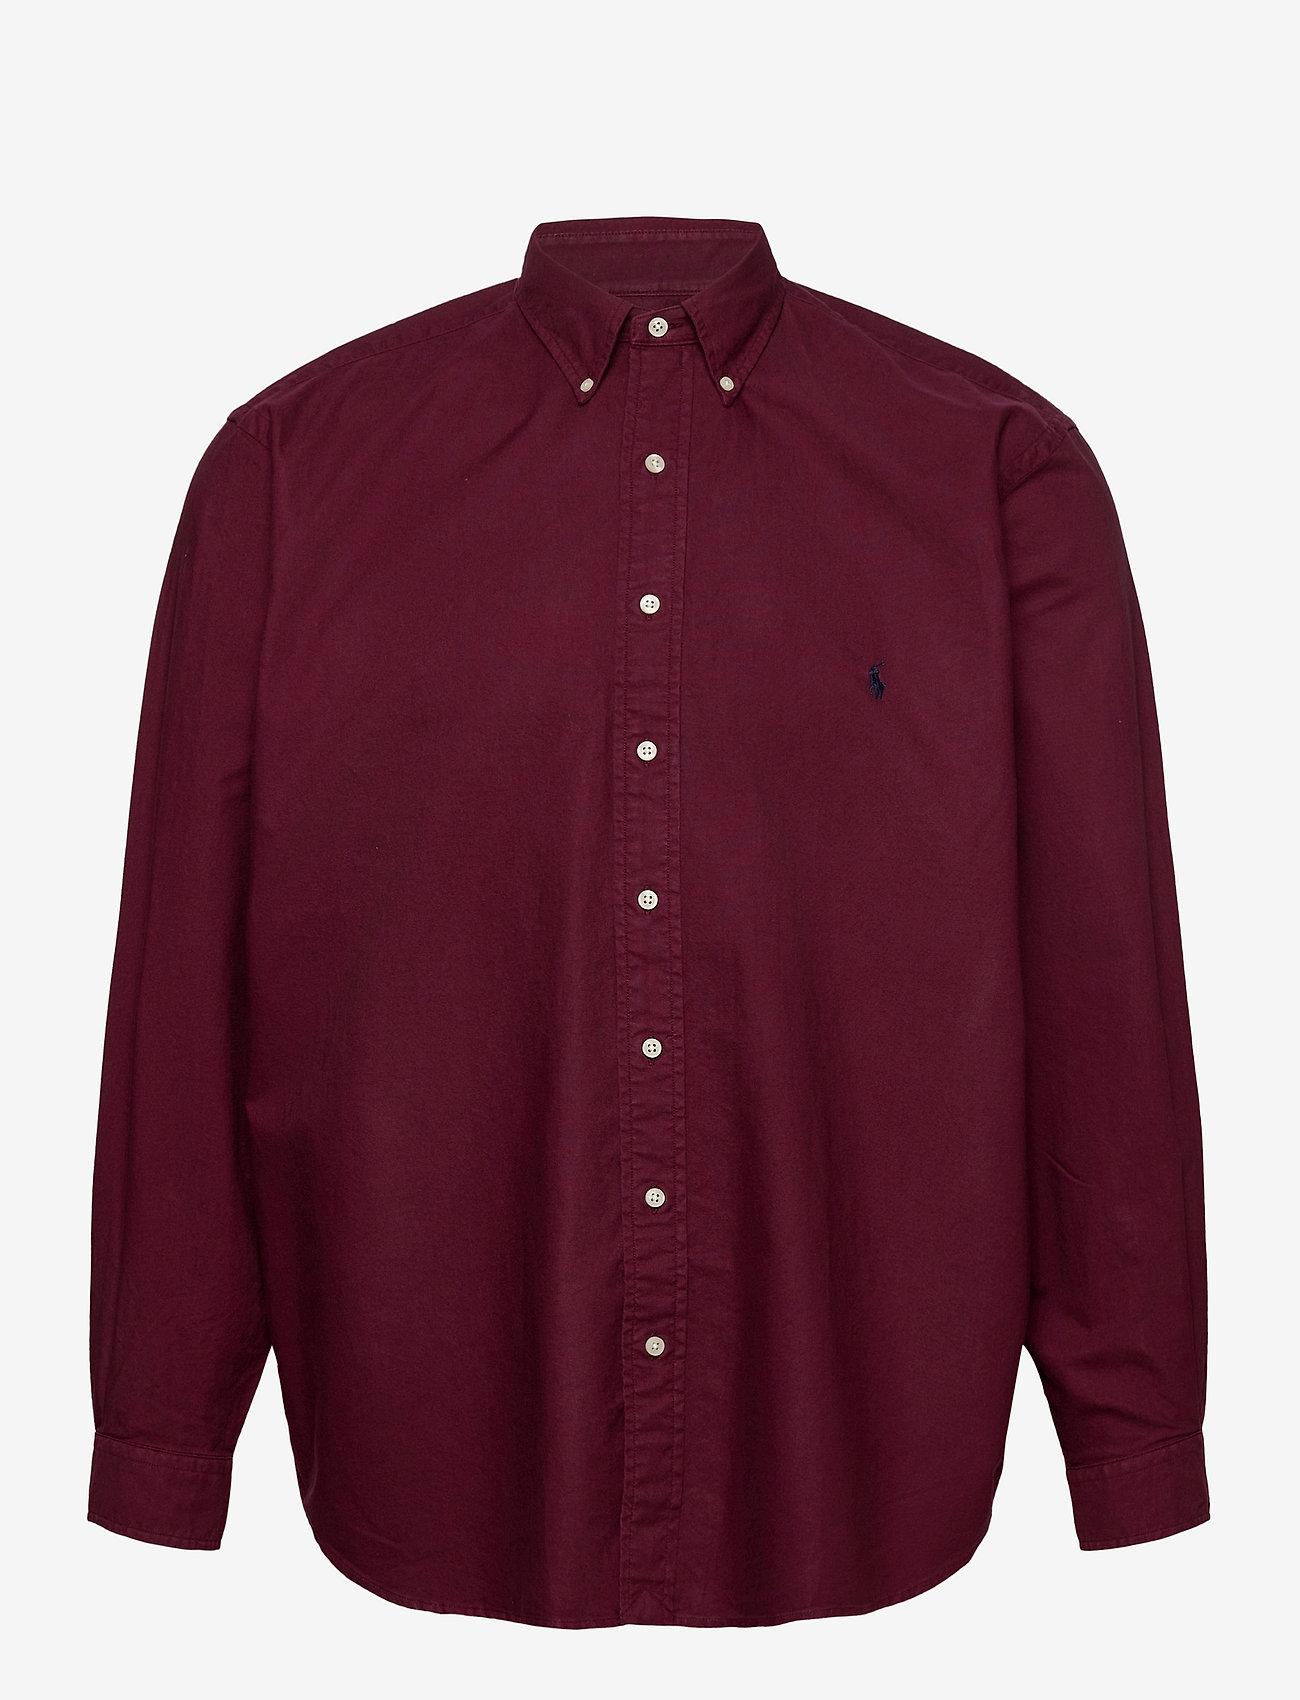 Polo Ralph Lauren Big & Tall - Garment-Dyed Oxford Shirt - casual shirts - classic wine - 0